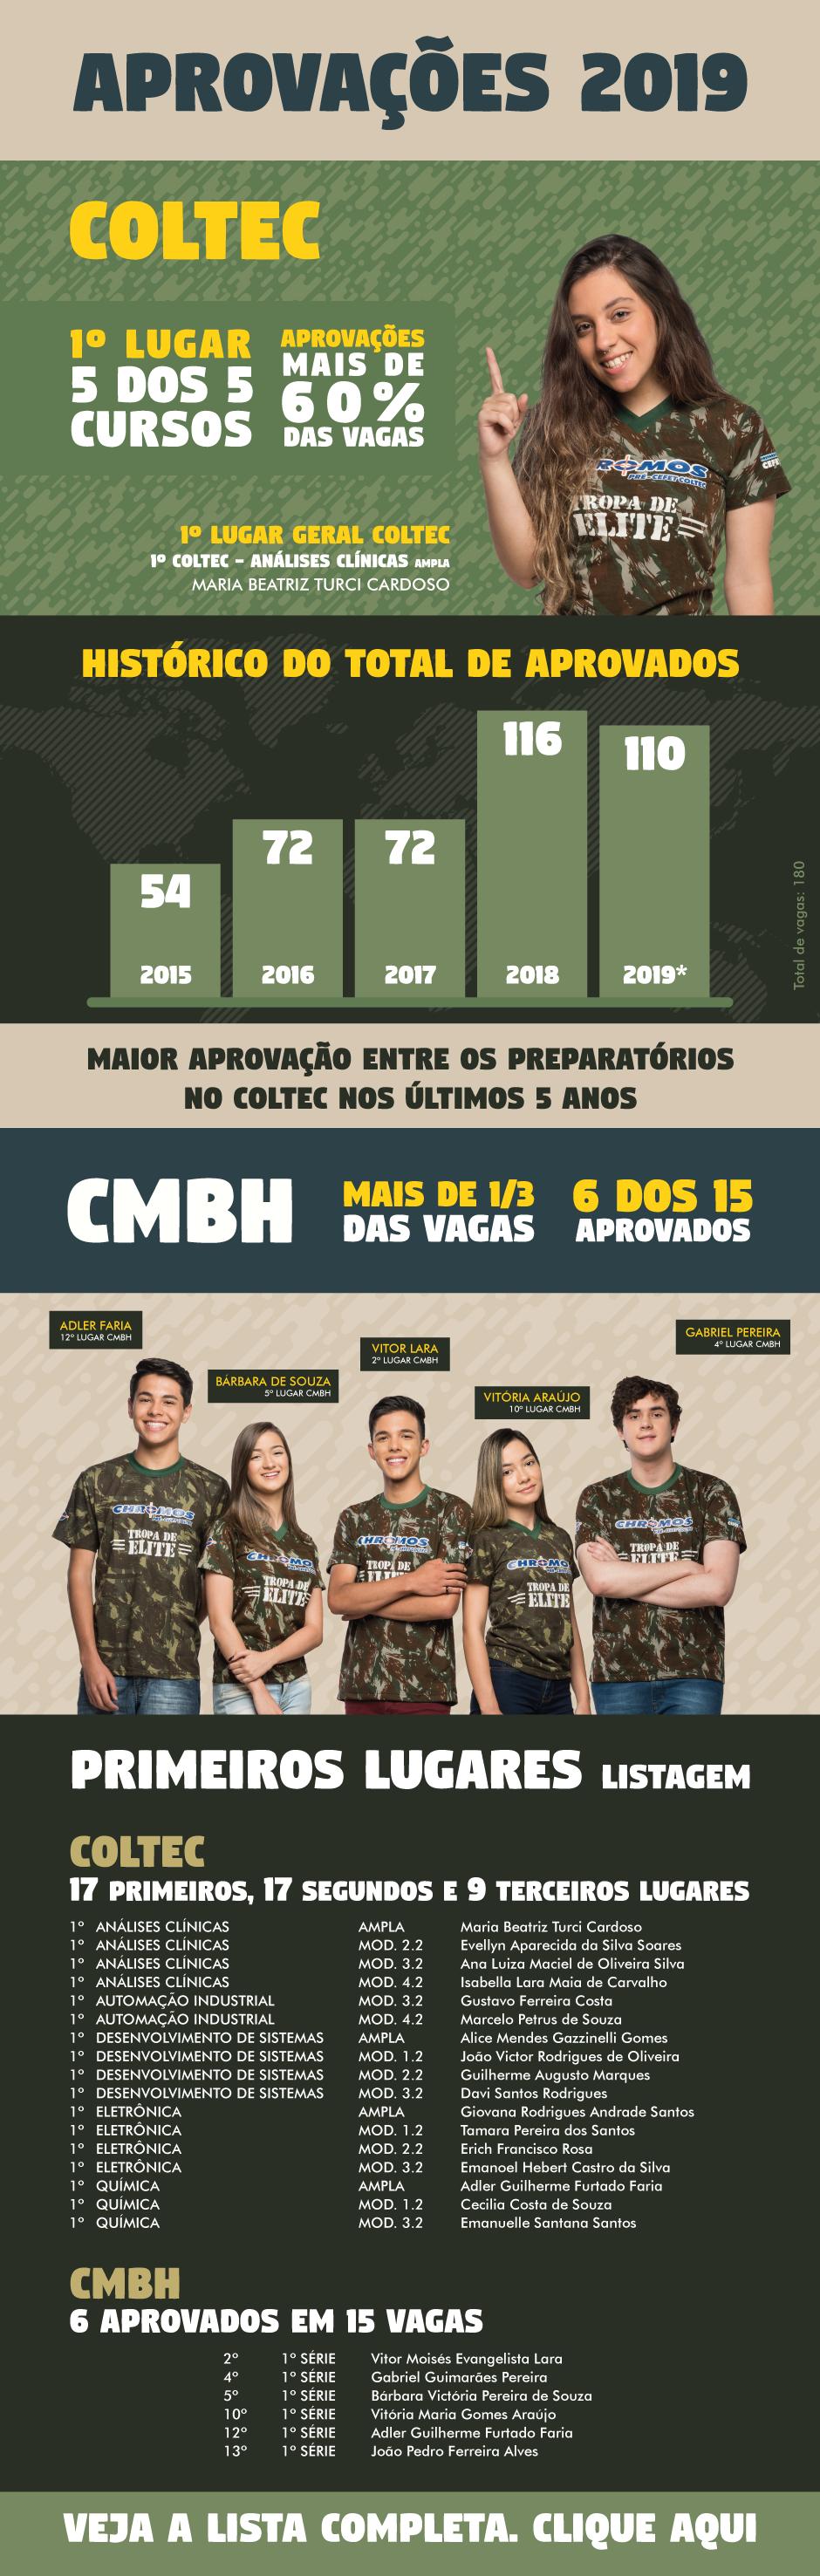 Aprovados Coltec 2019